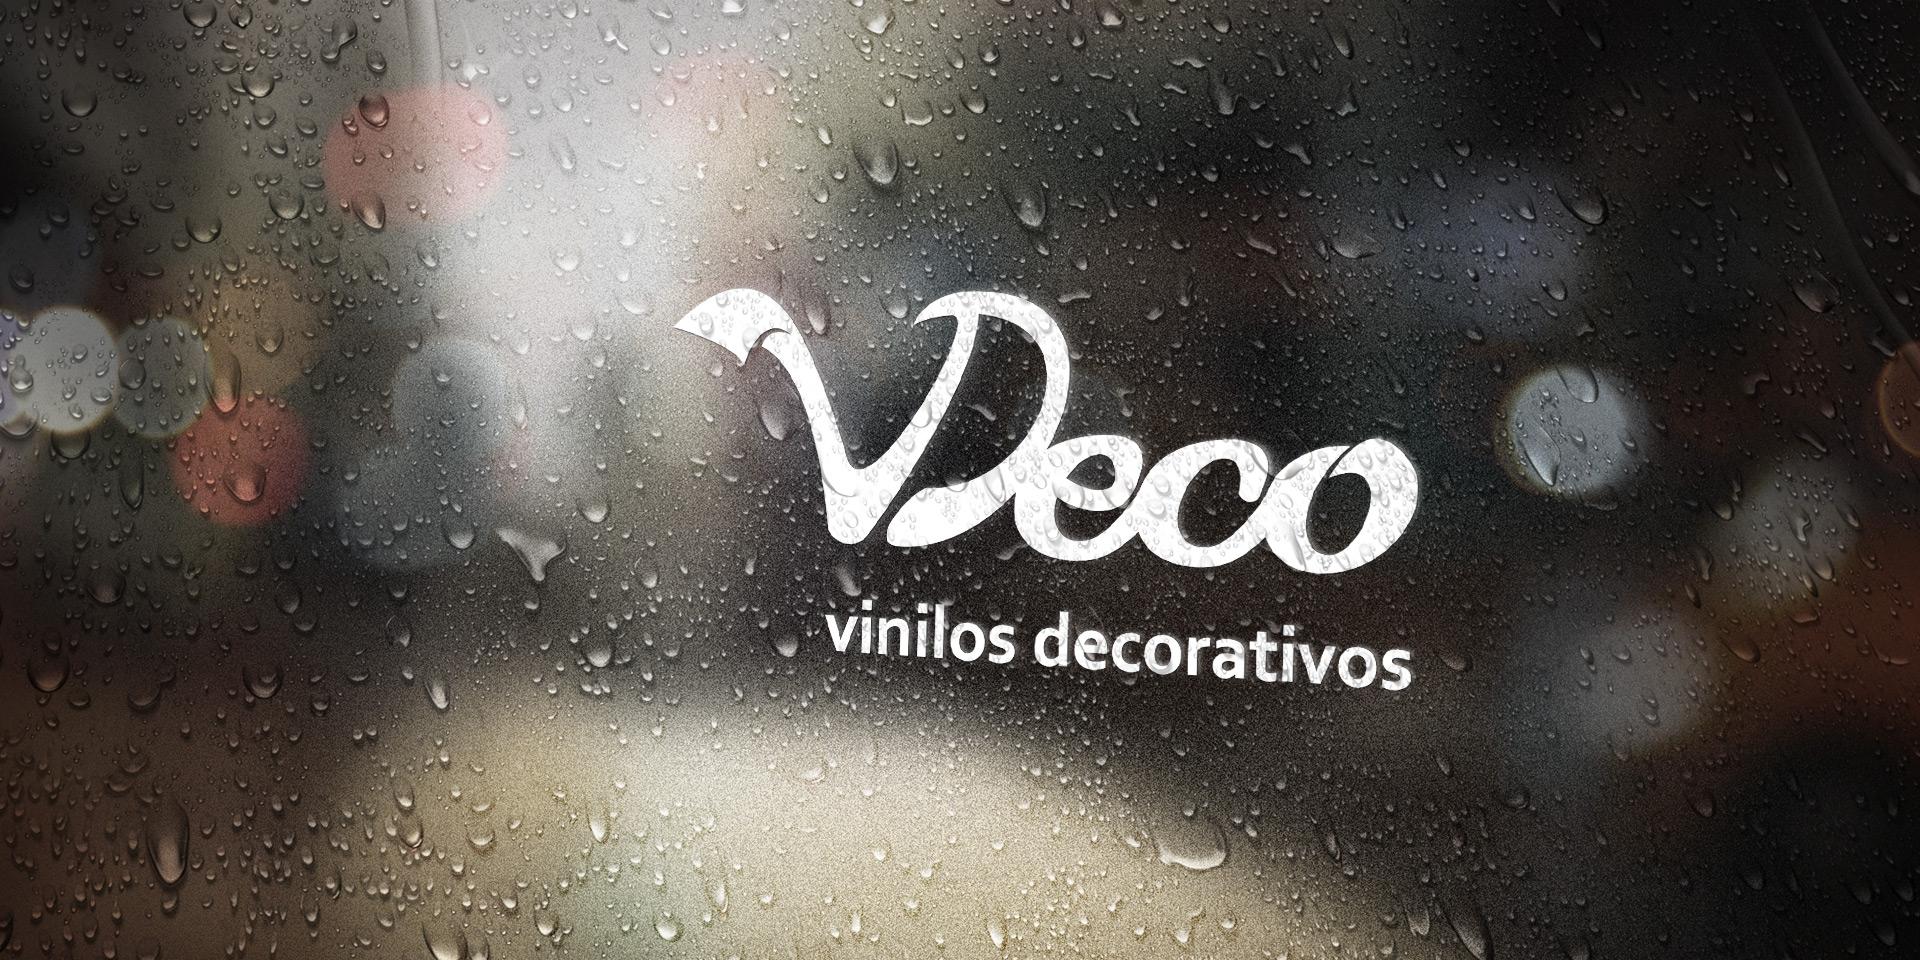 VDeco | Vinilos Decorativos